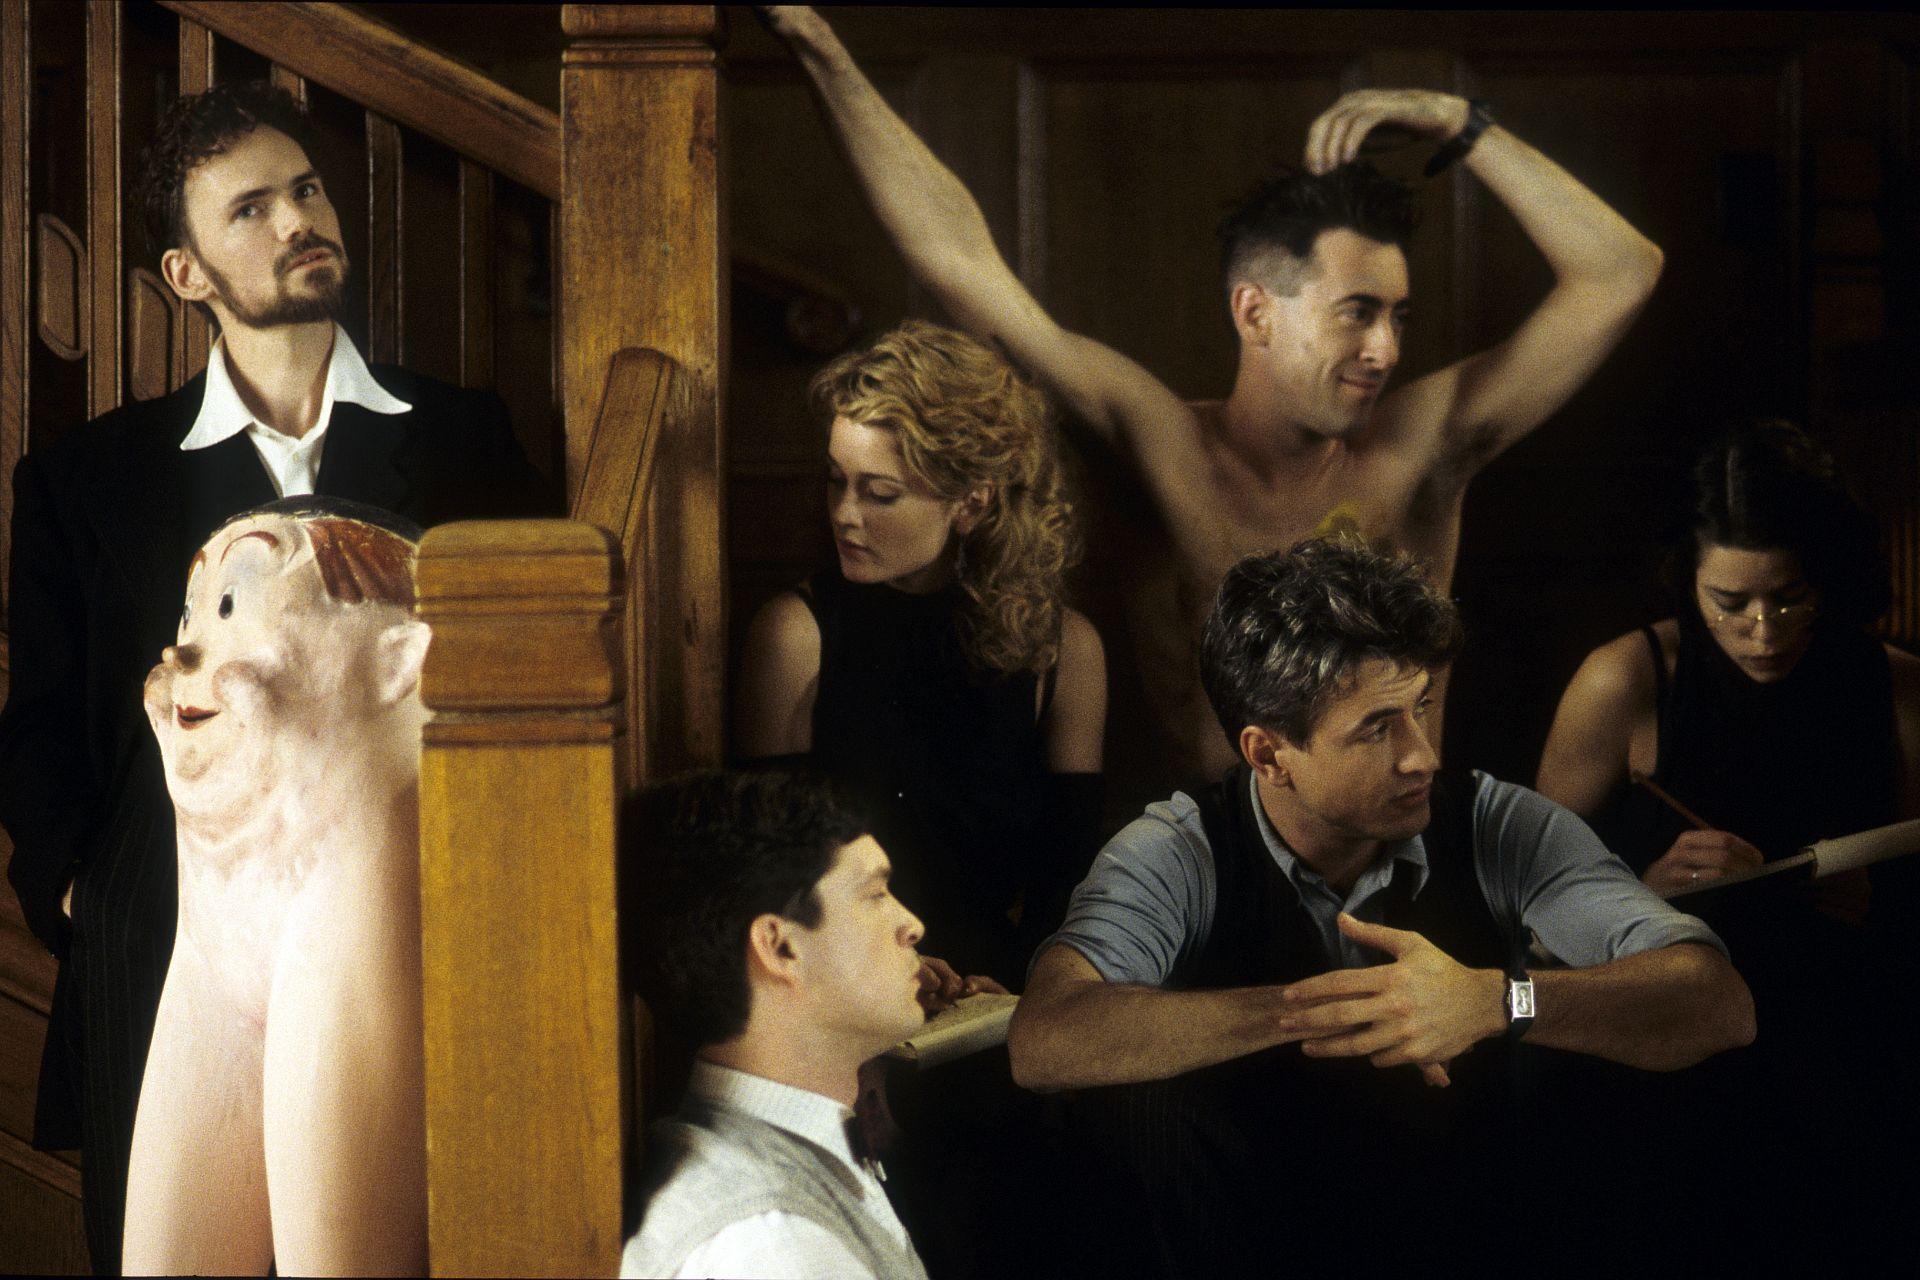 filmy o sexu drsny svet